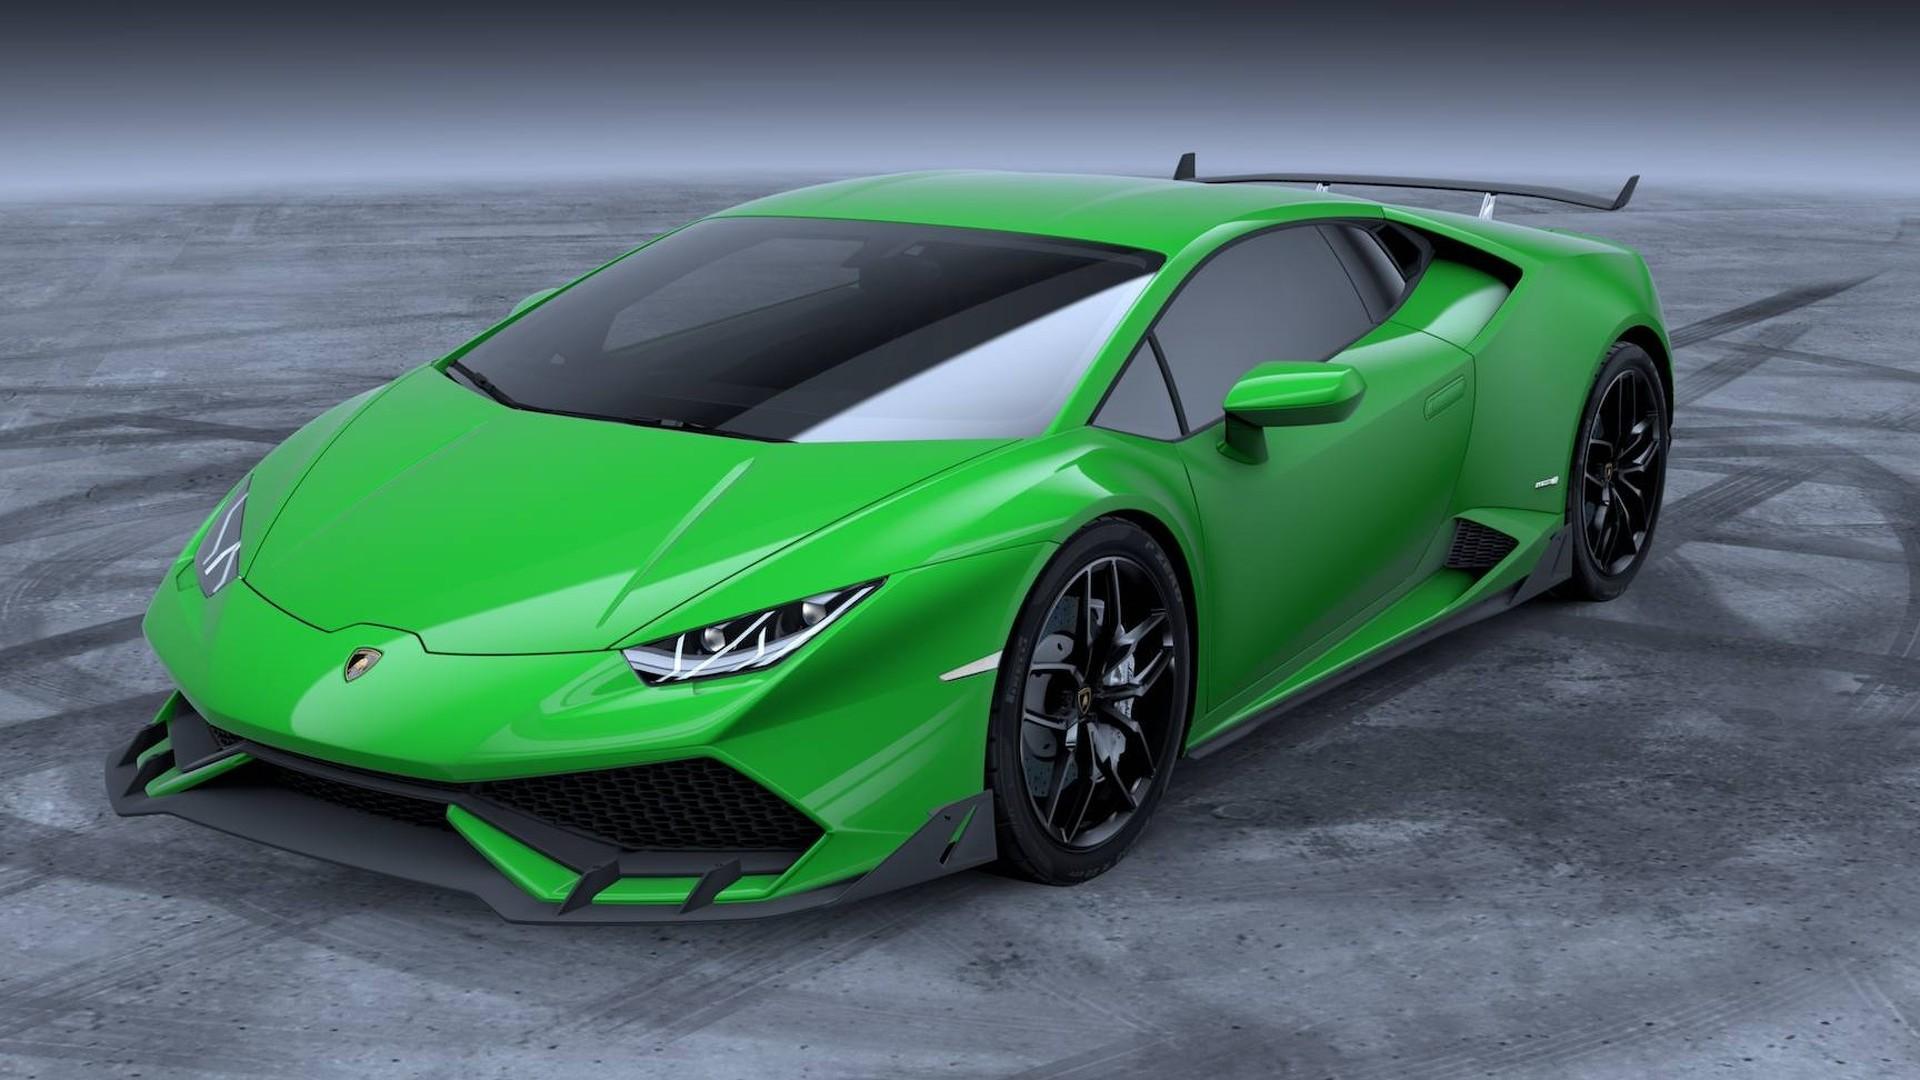 Lamborghini Introduces 22 484 Aero Kit For The Huracan